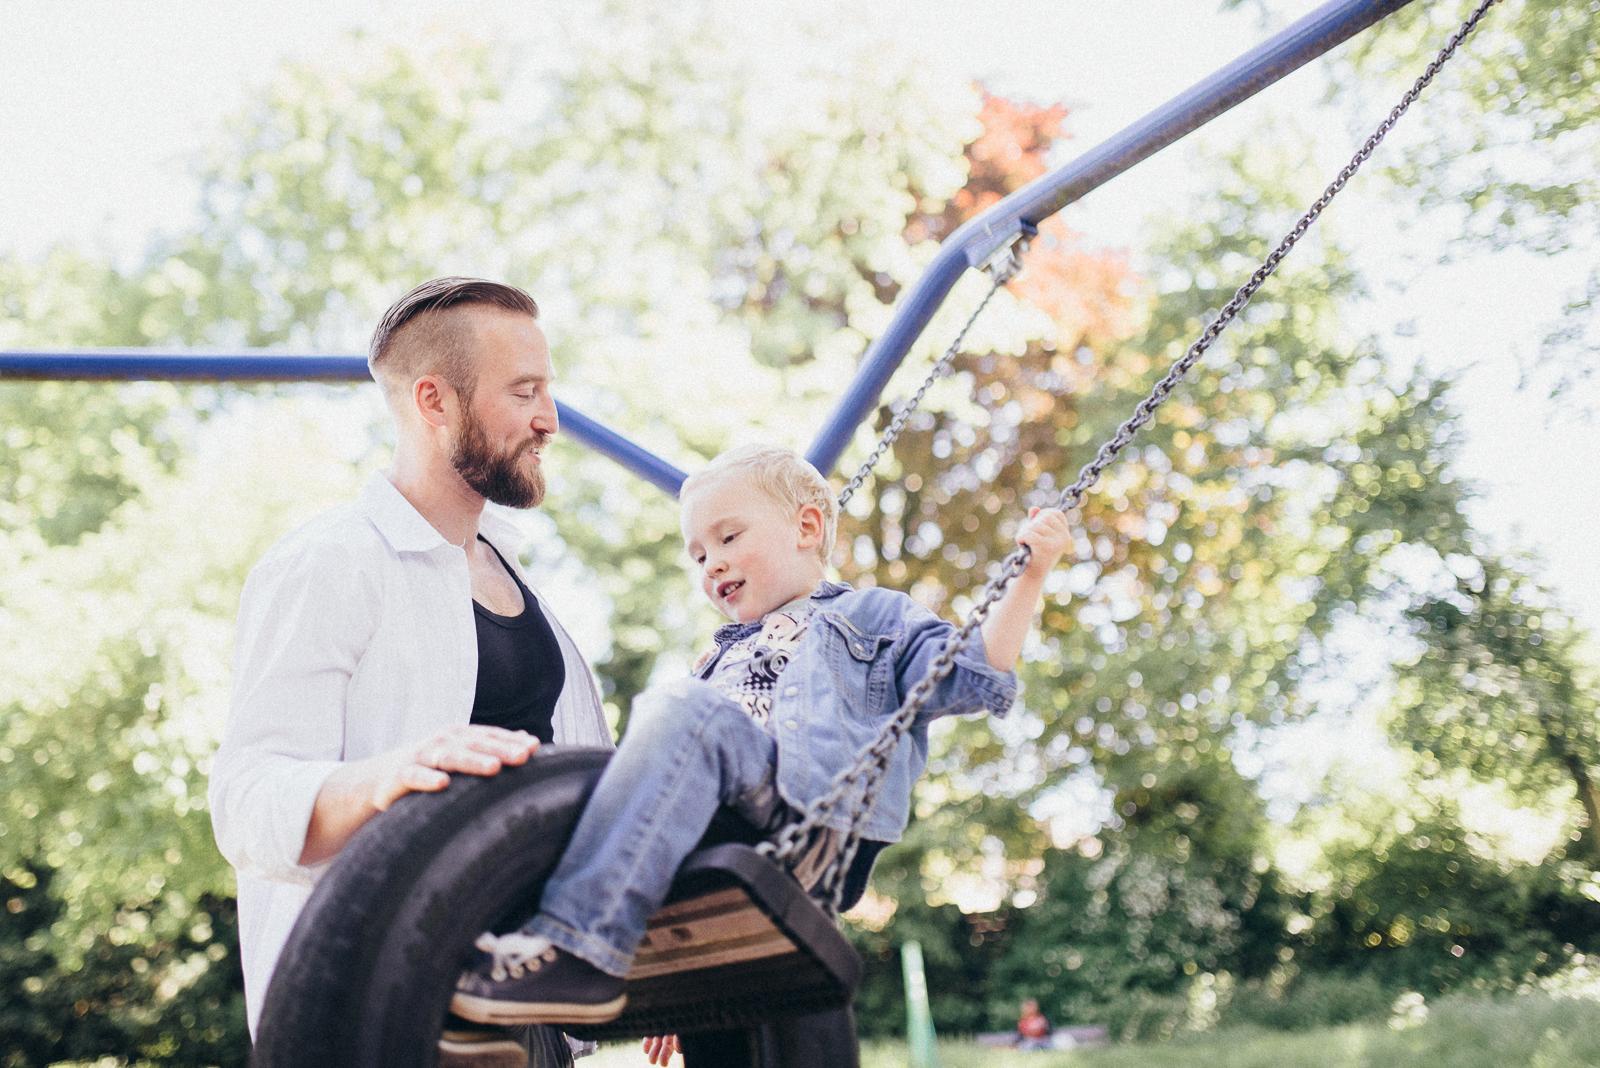 019-designparaplus-familie-fotografie-essen-familienshooting